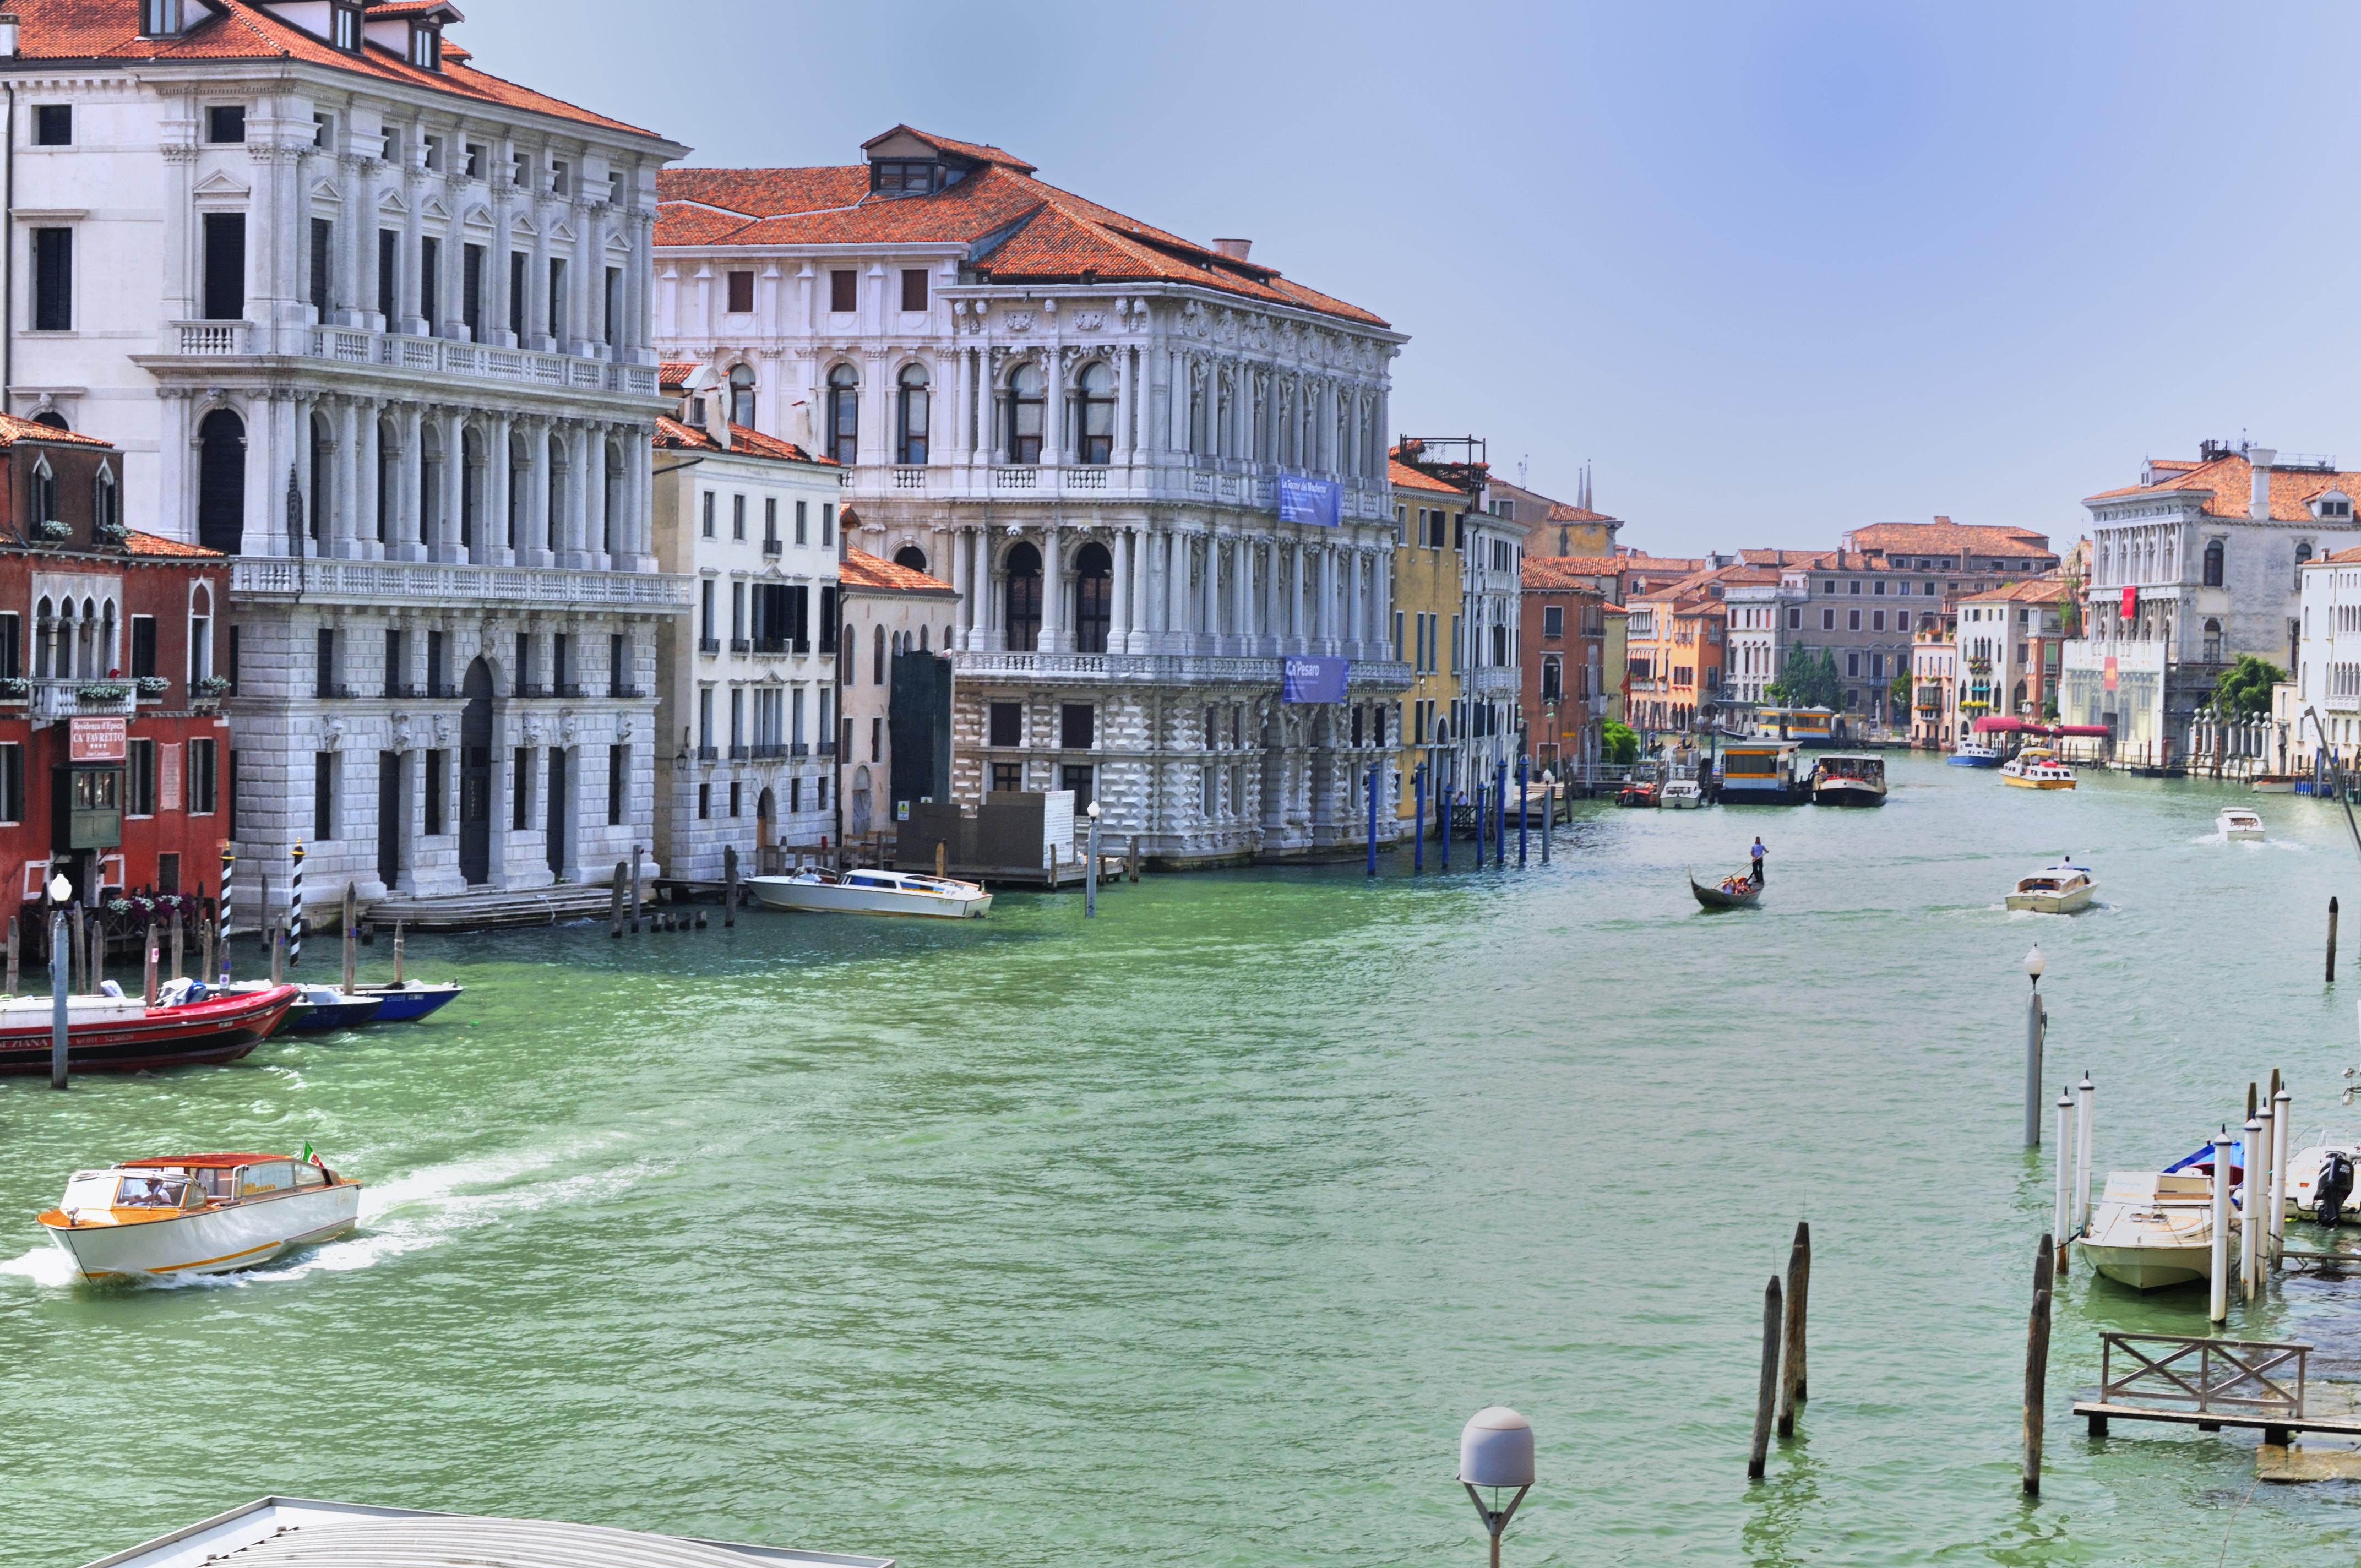 Hotel_Ca_Sagredo_-_Grand_Canal_-_Rialto_-_Venice_Italy_Venezia_-_Creative_Commons_by_gnuckx_4776651712.jpg